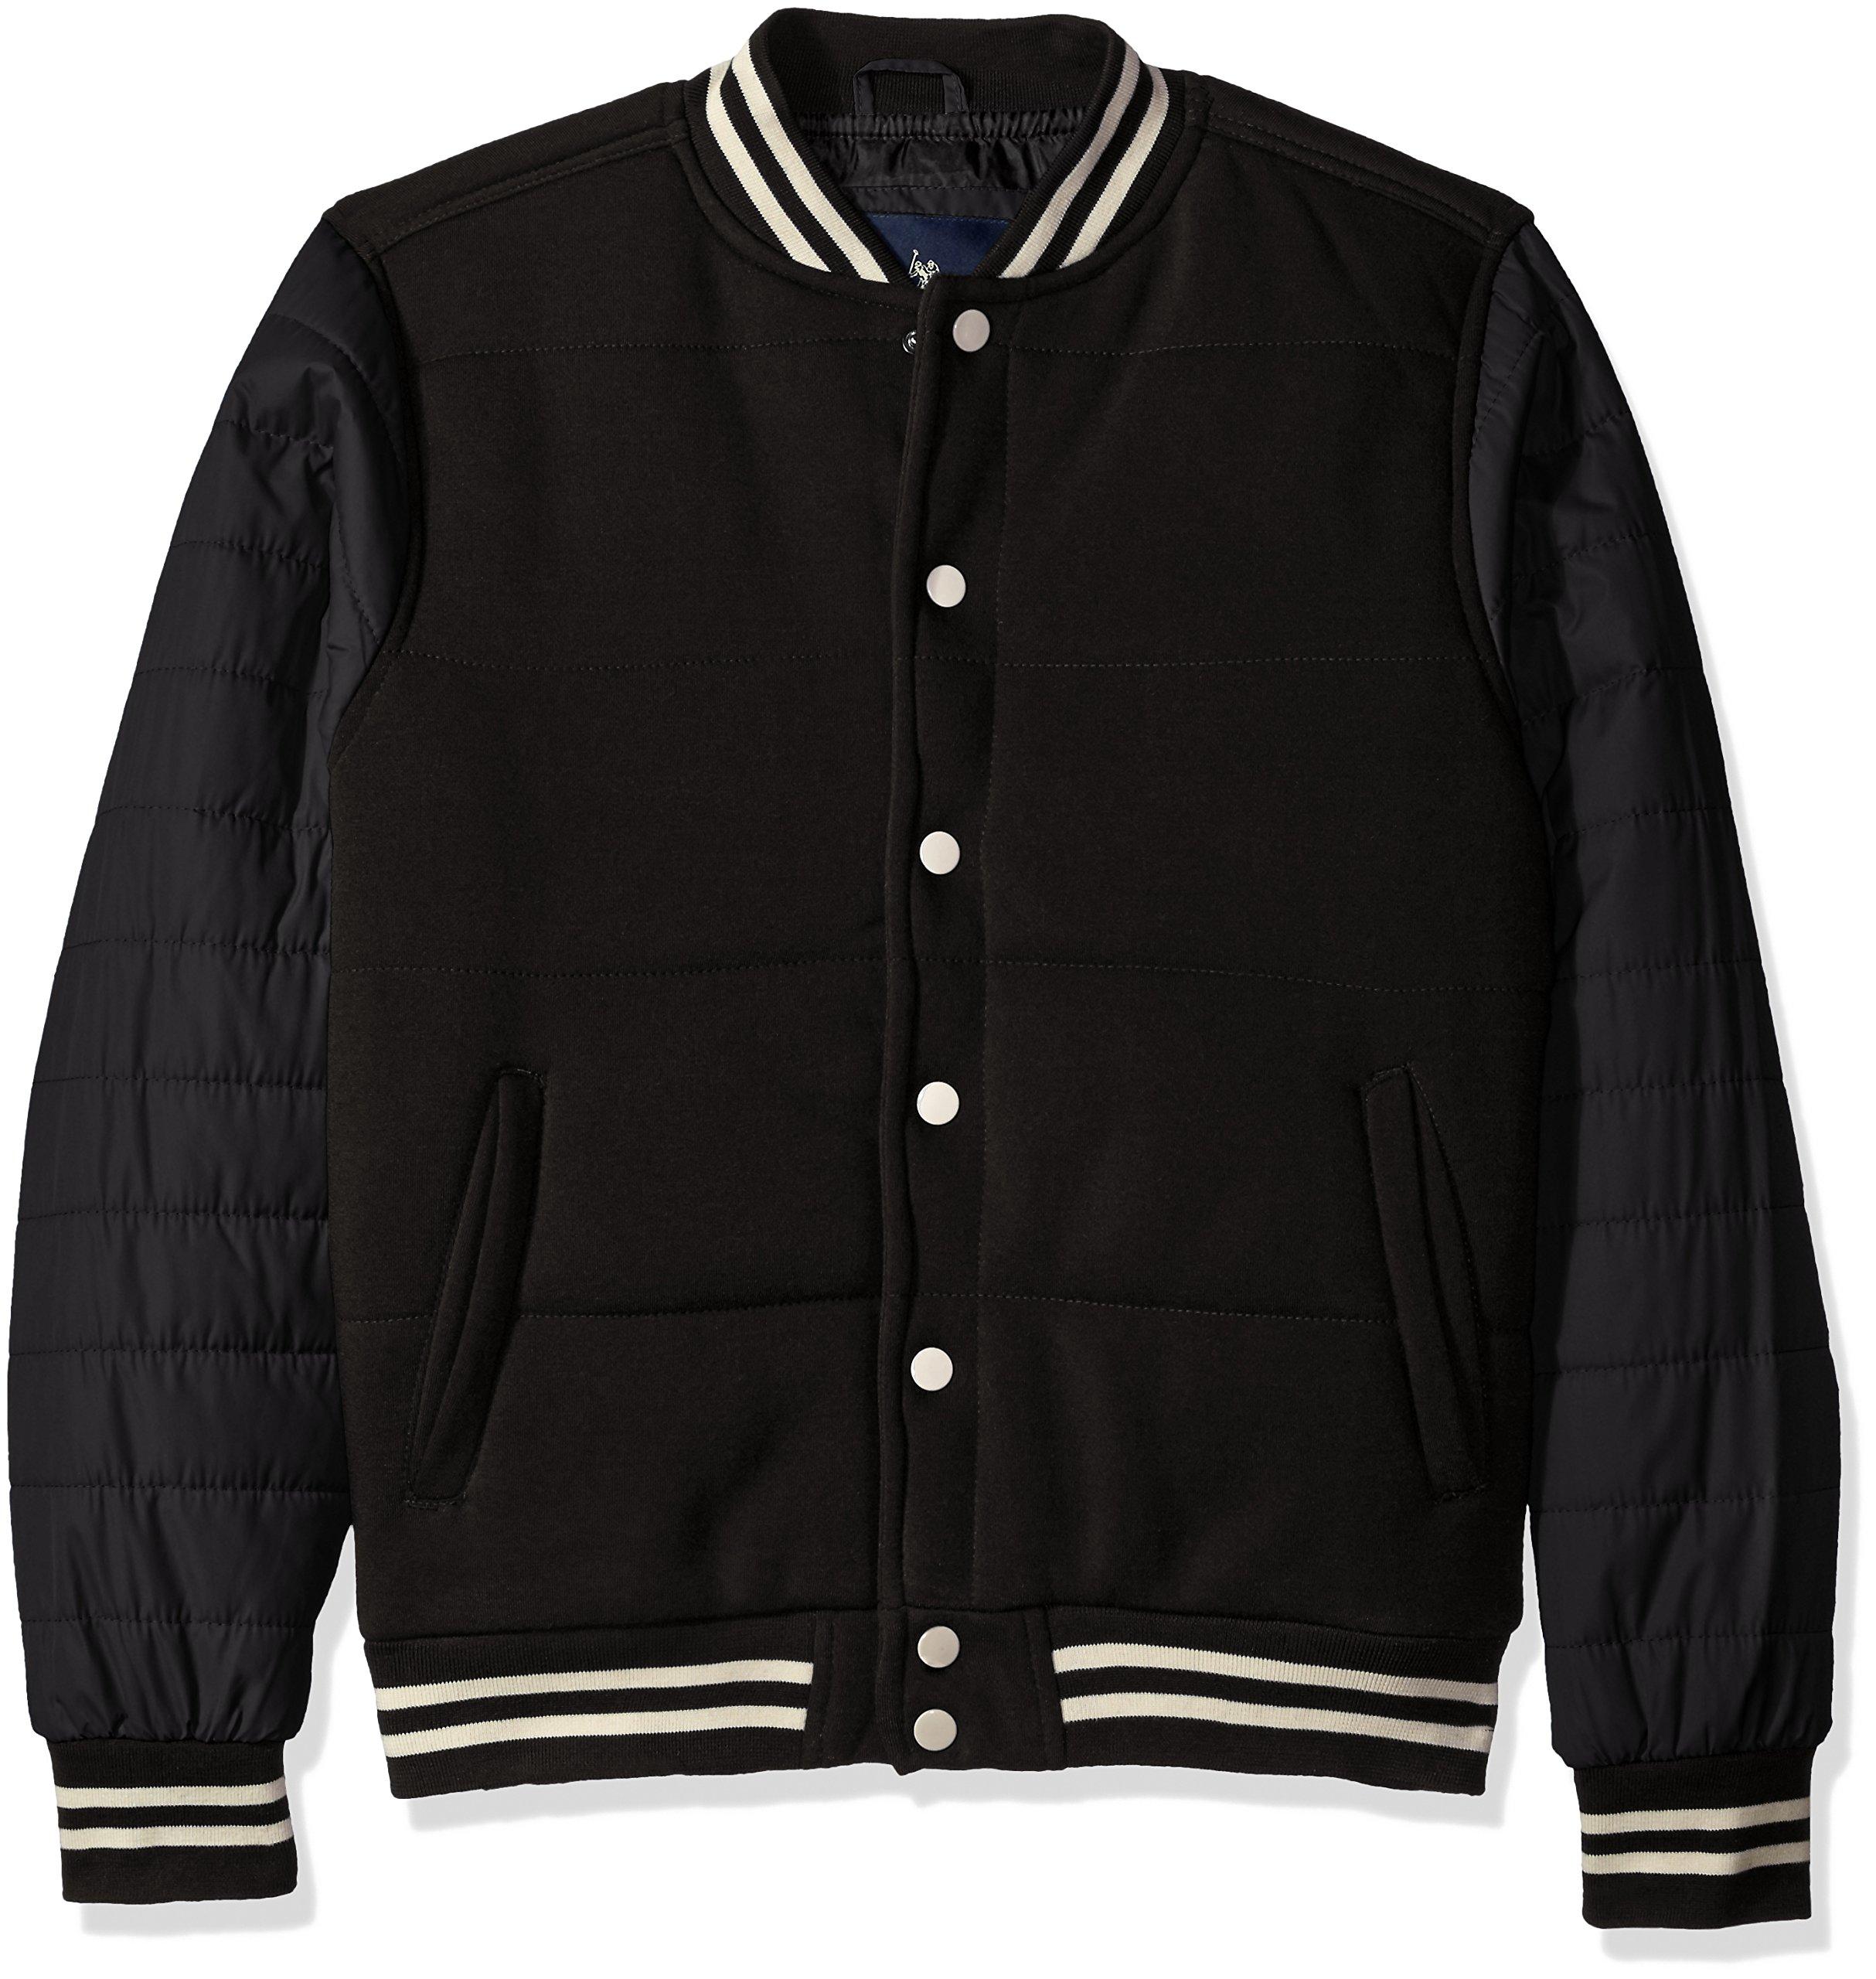 U.S. Polo Assn. Men's Baseball Fleece Jacket With Shell Sleeves, Black, L